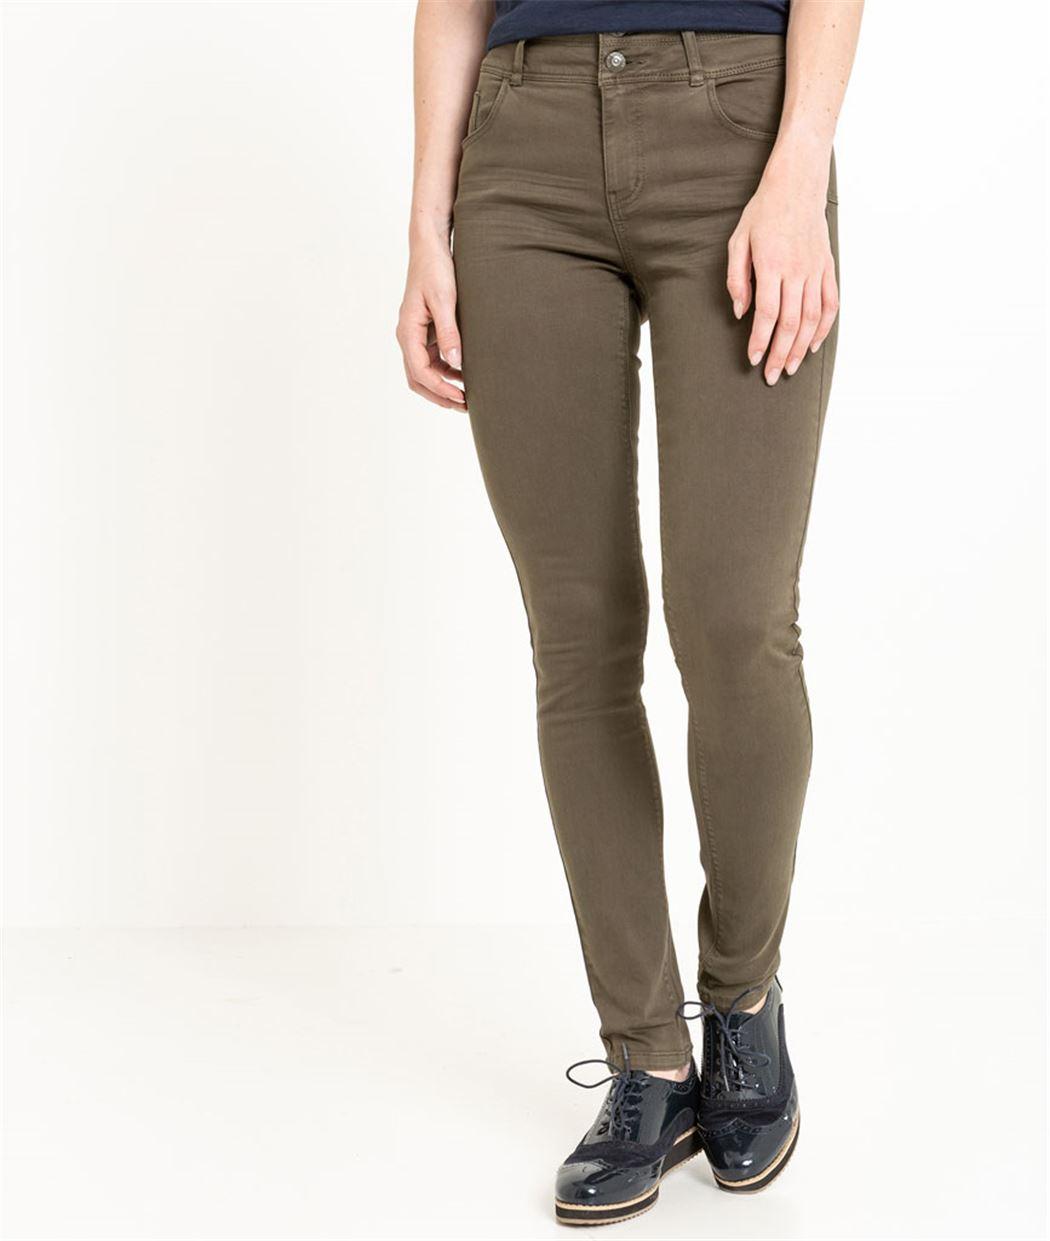 pantalon femme slim taille haute kaki grain de malice. Black Bedroom Furniture Sets. Home Design Ideas